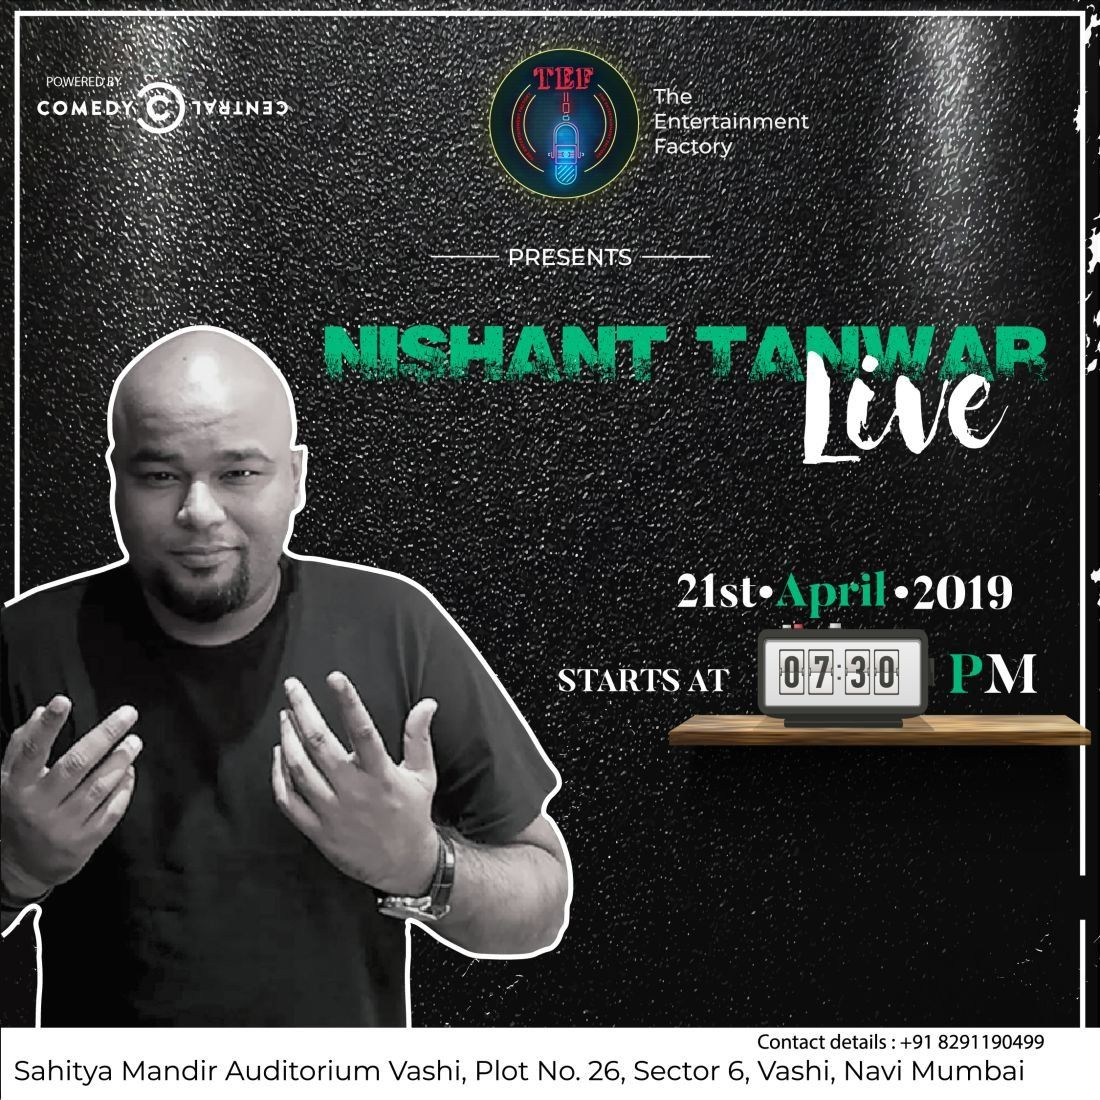 Nishant Tanwar Live